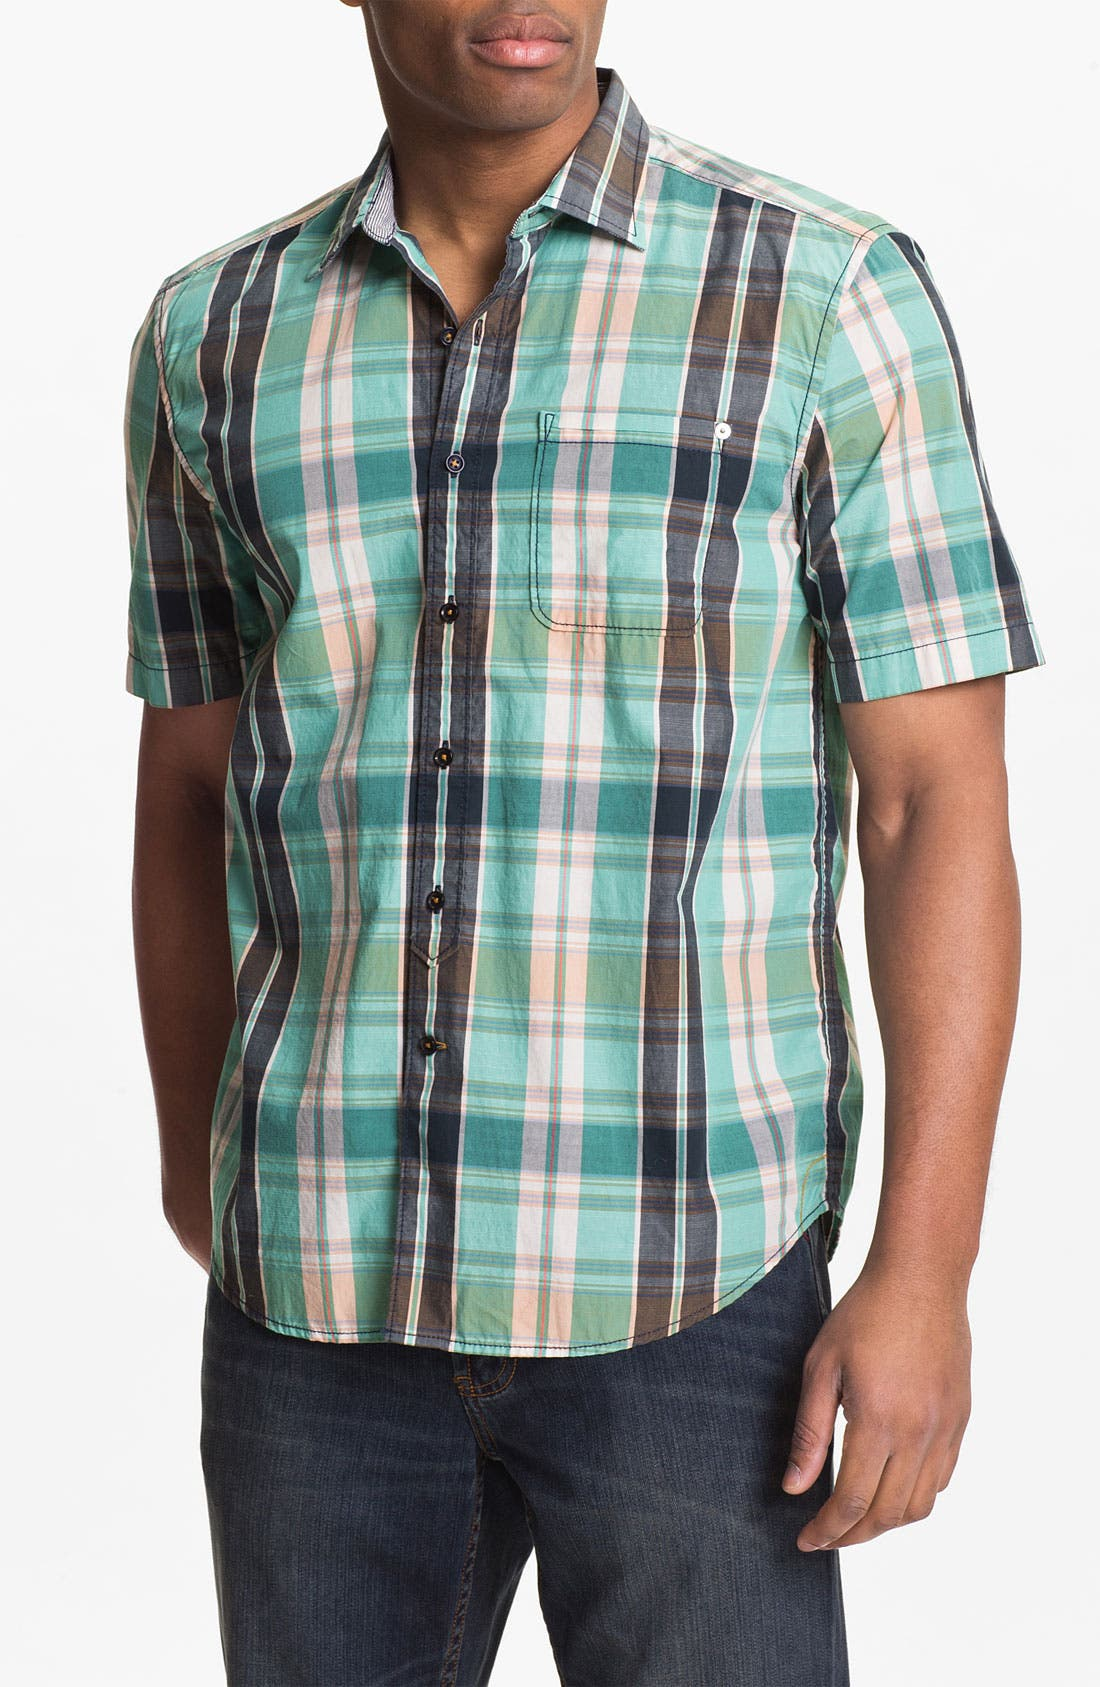 Alternate Image 1 Selected - Tommy Bahama Denim 'Pescadero Plaid' Sport Shirt